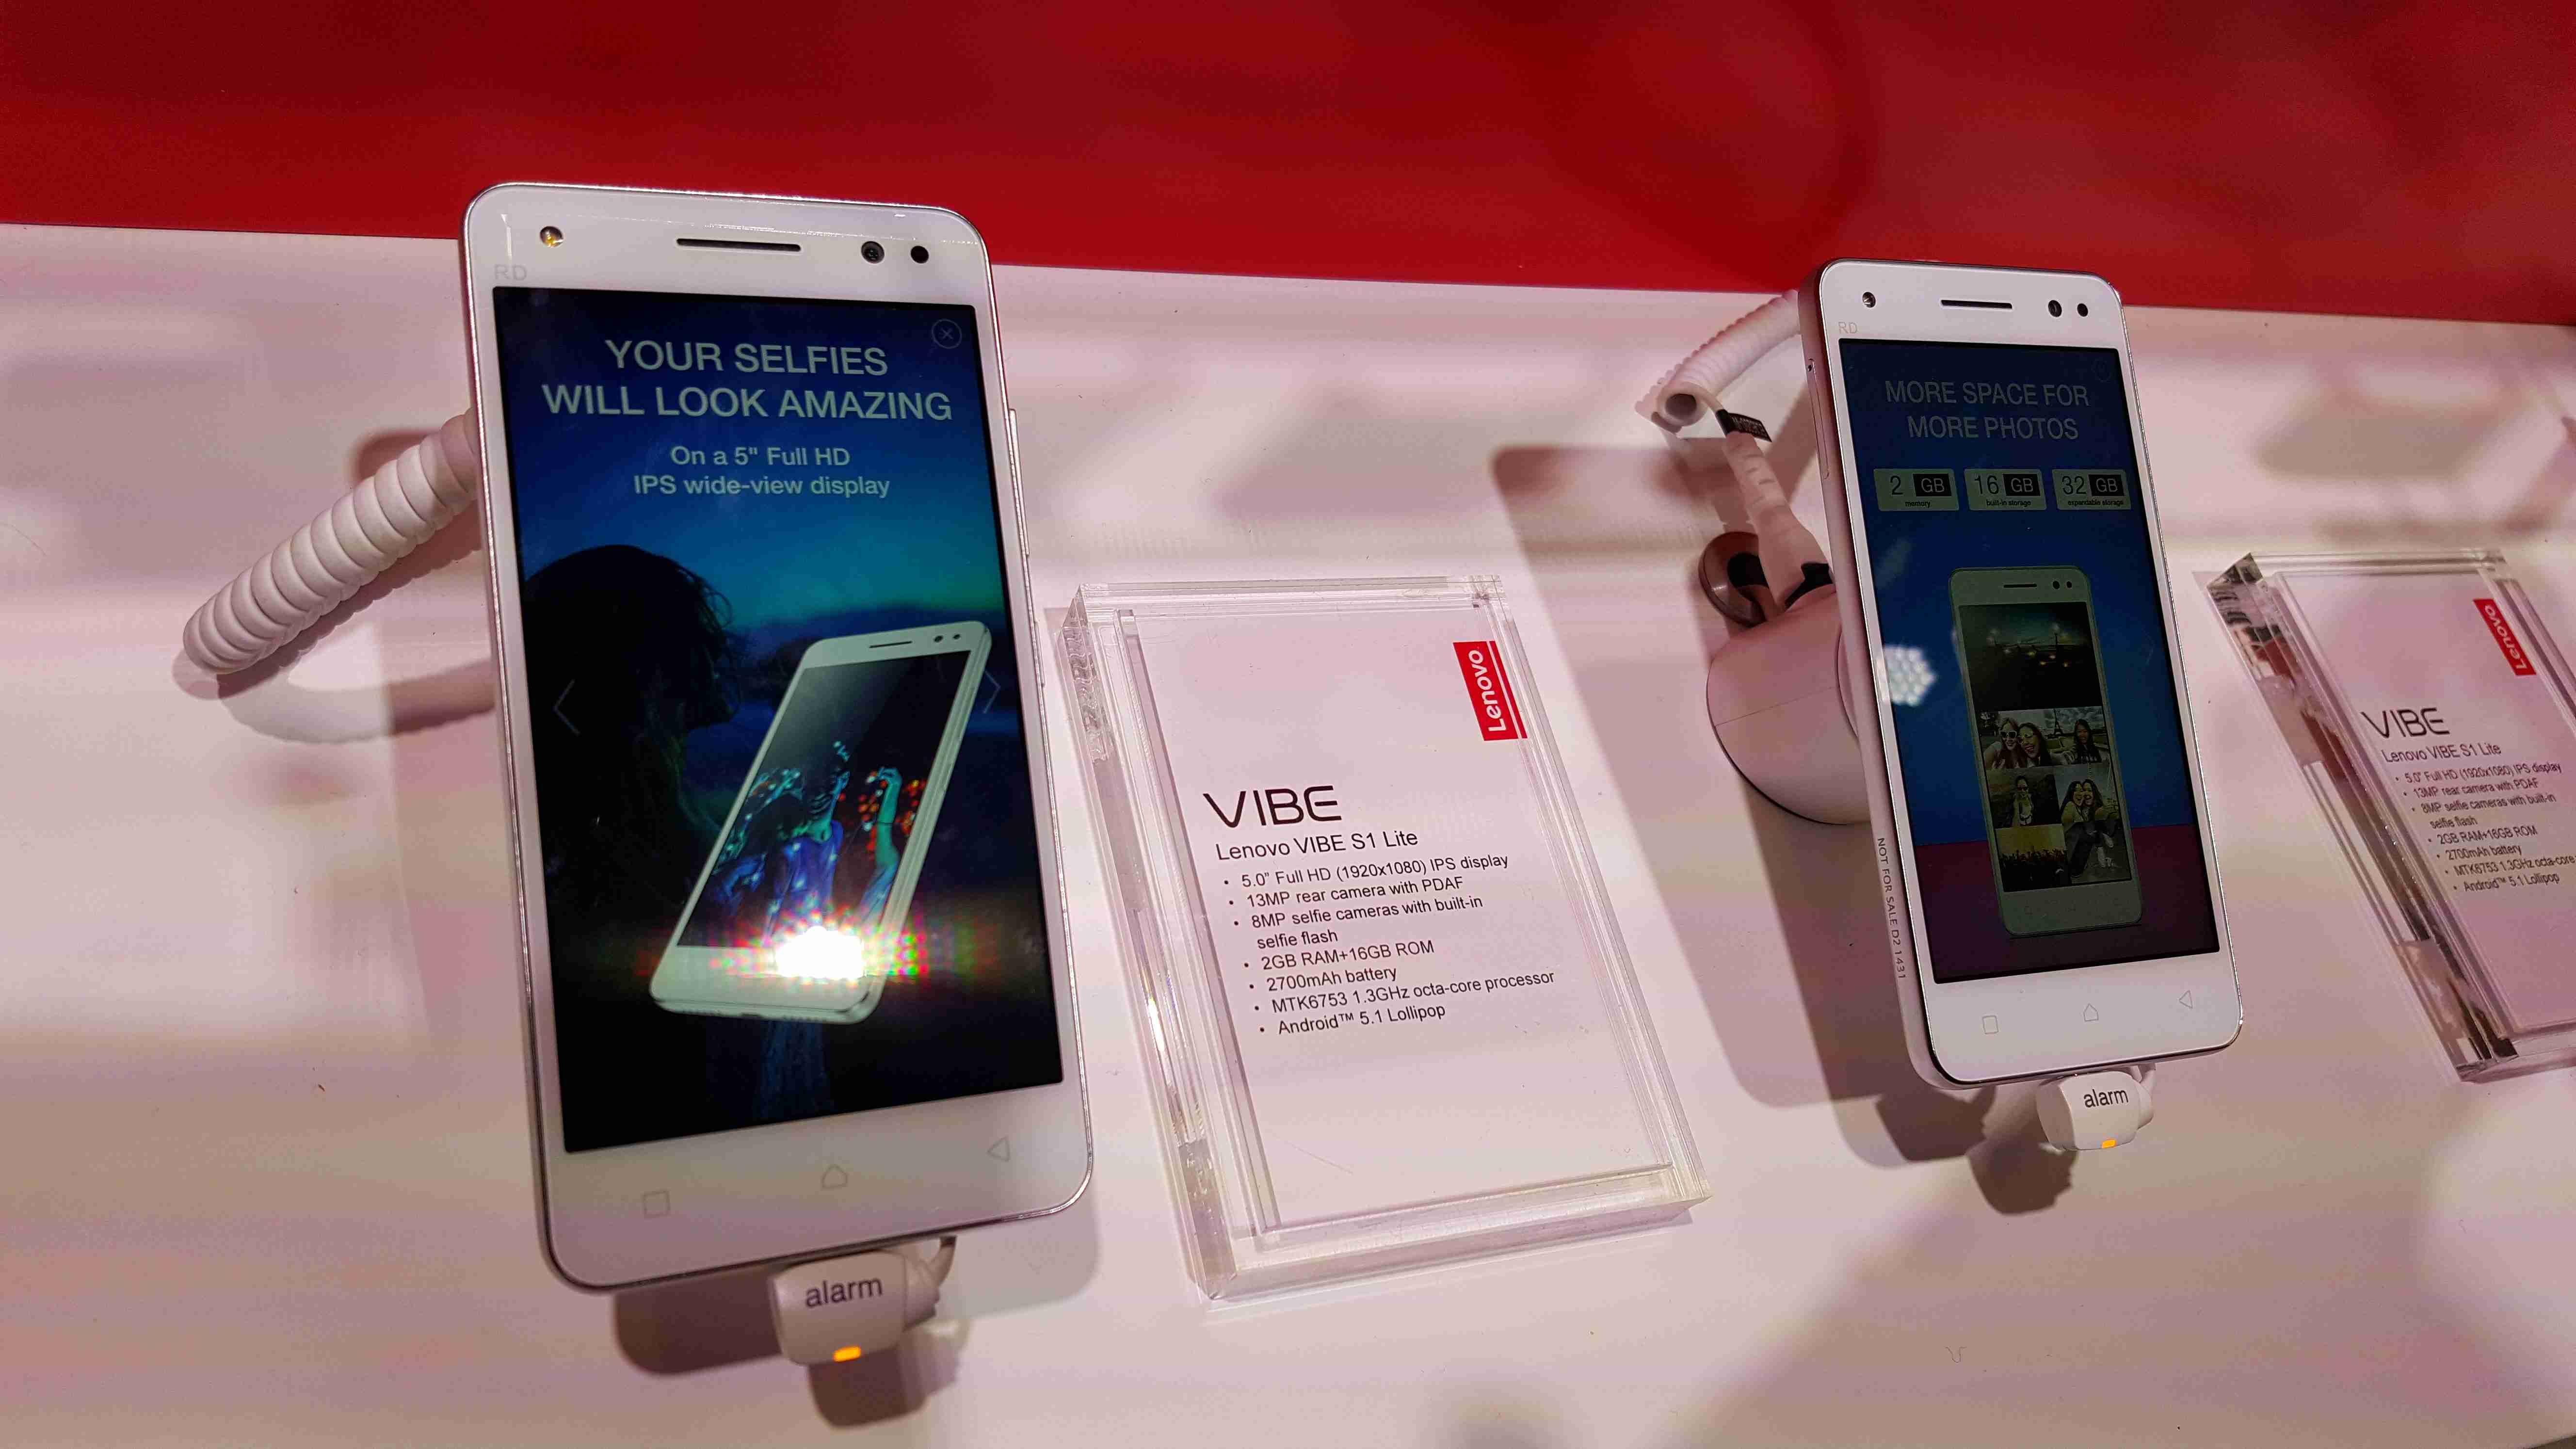 VIDEO touchIT Nové smartf³ny od Lenova zavtajº na Slovensko už v aprli